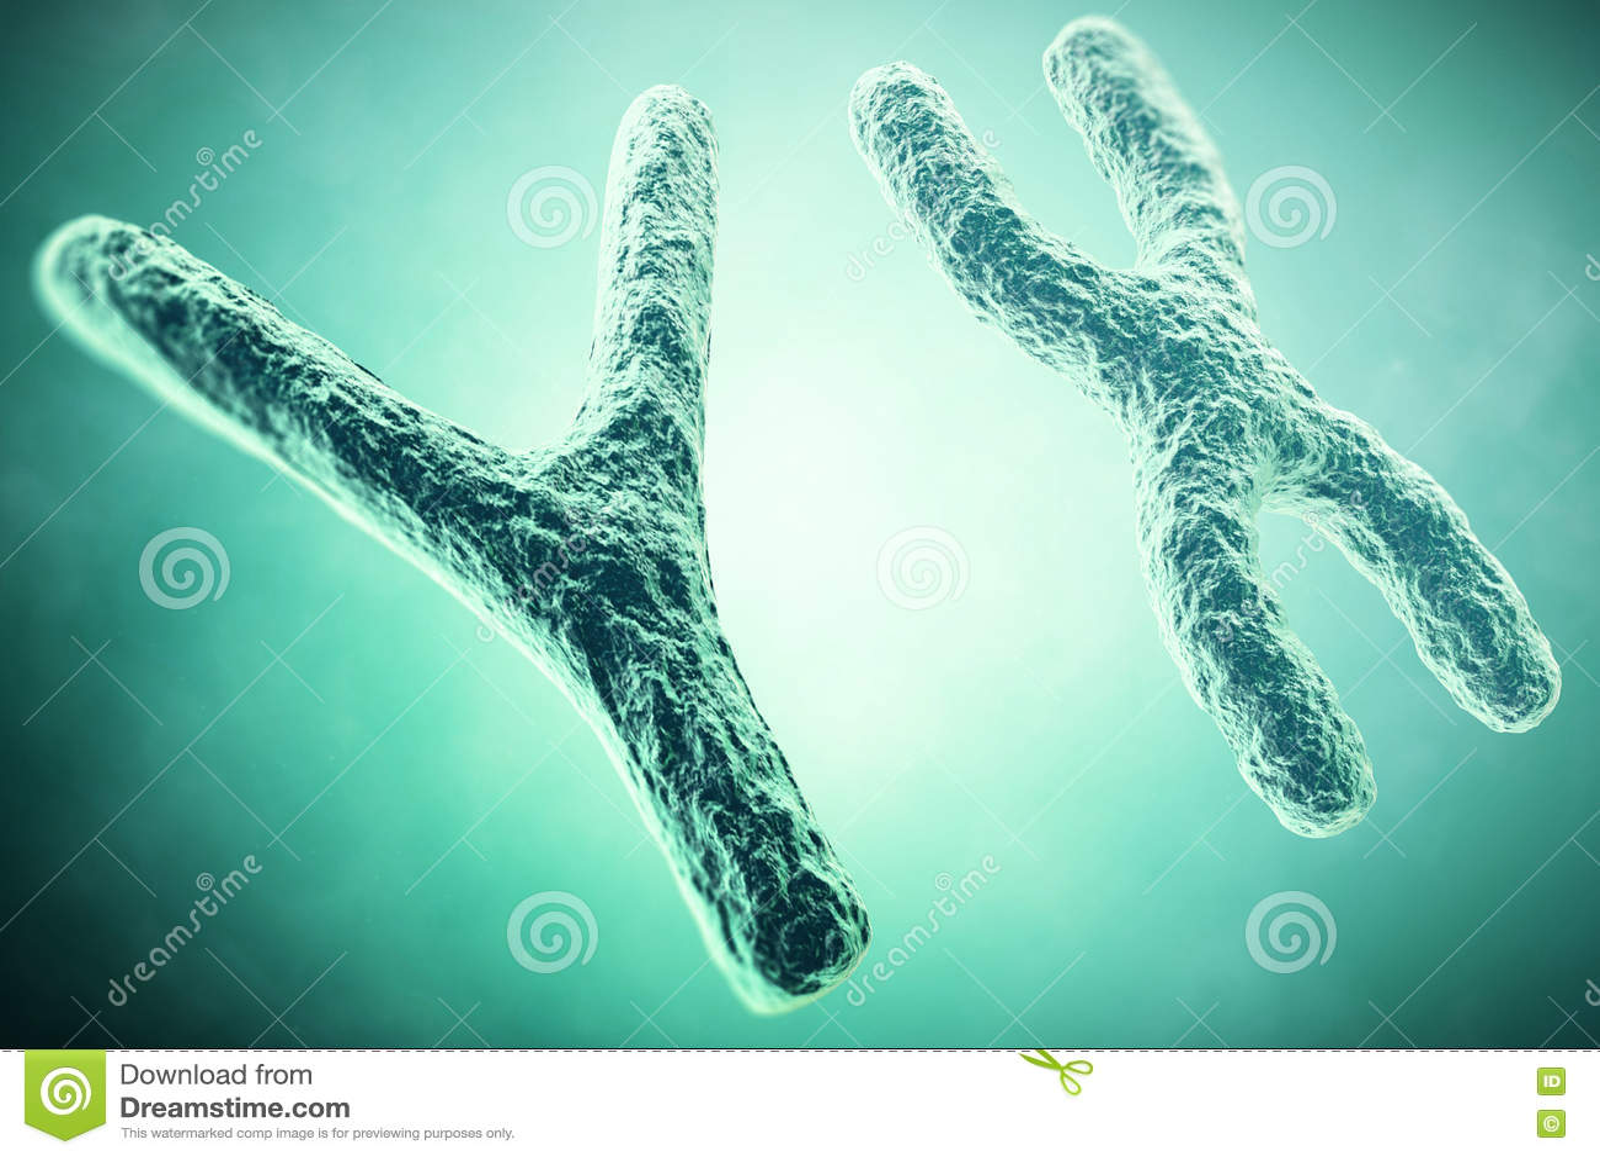 Хромосома YX на переднем плане, научная концепция иллюстрация 3d